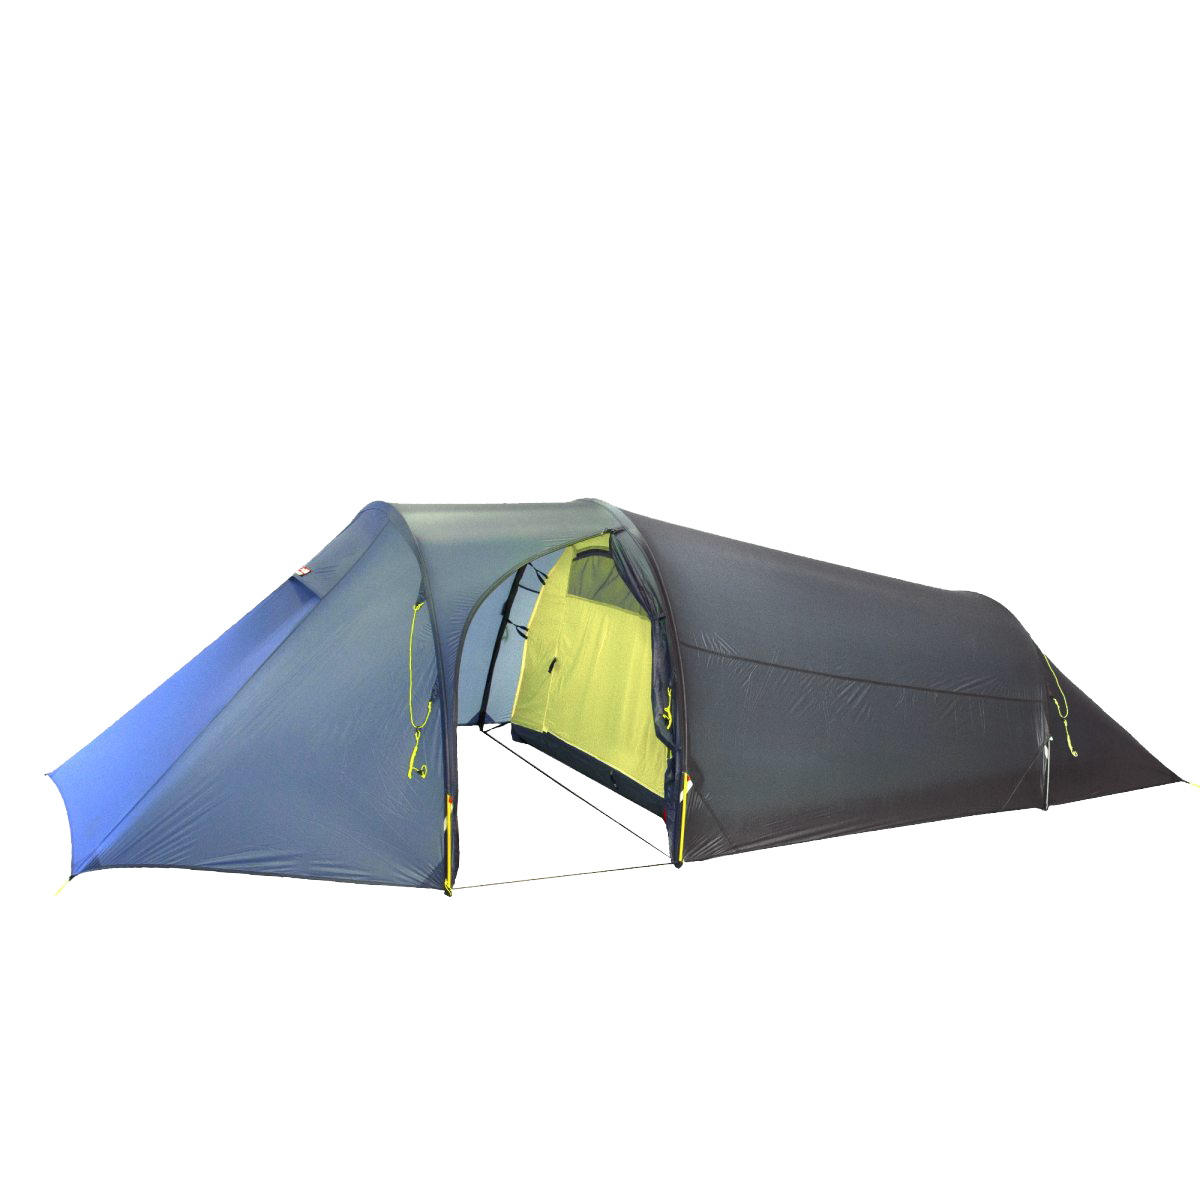 Helsport Sarek 2+ telt inkl. footprint   FINN.no